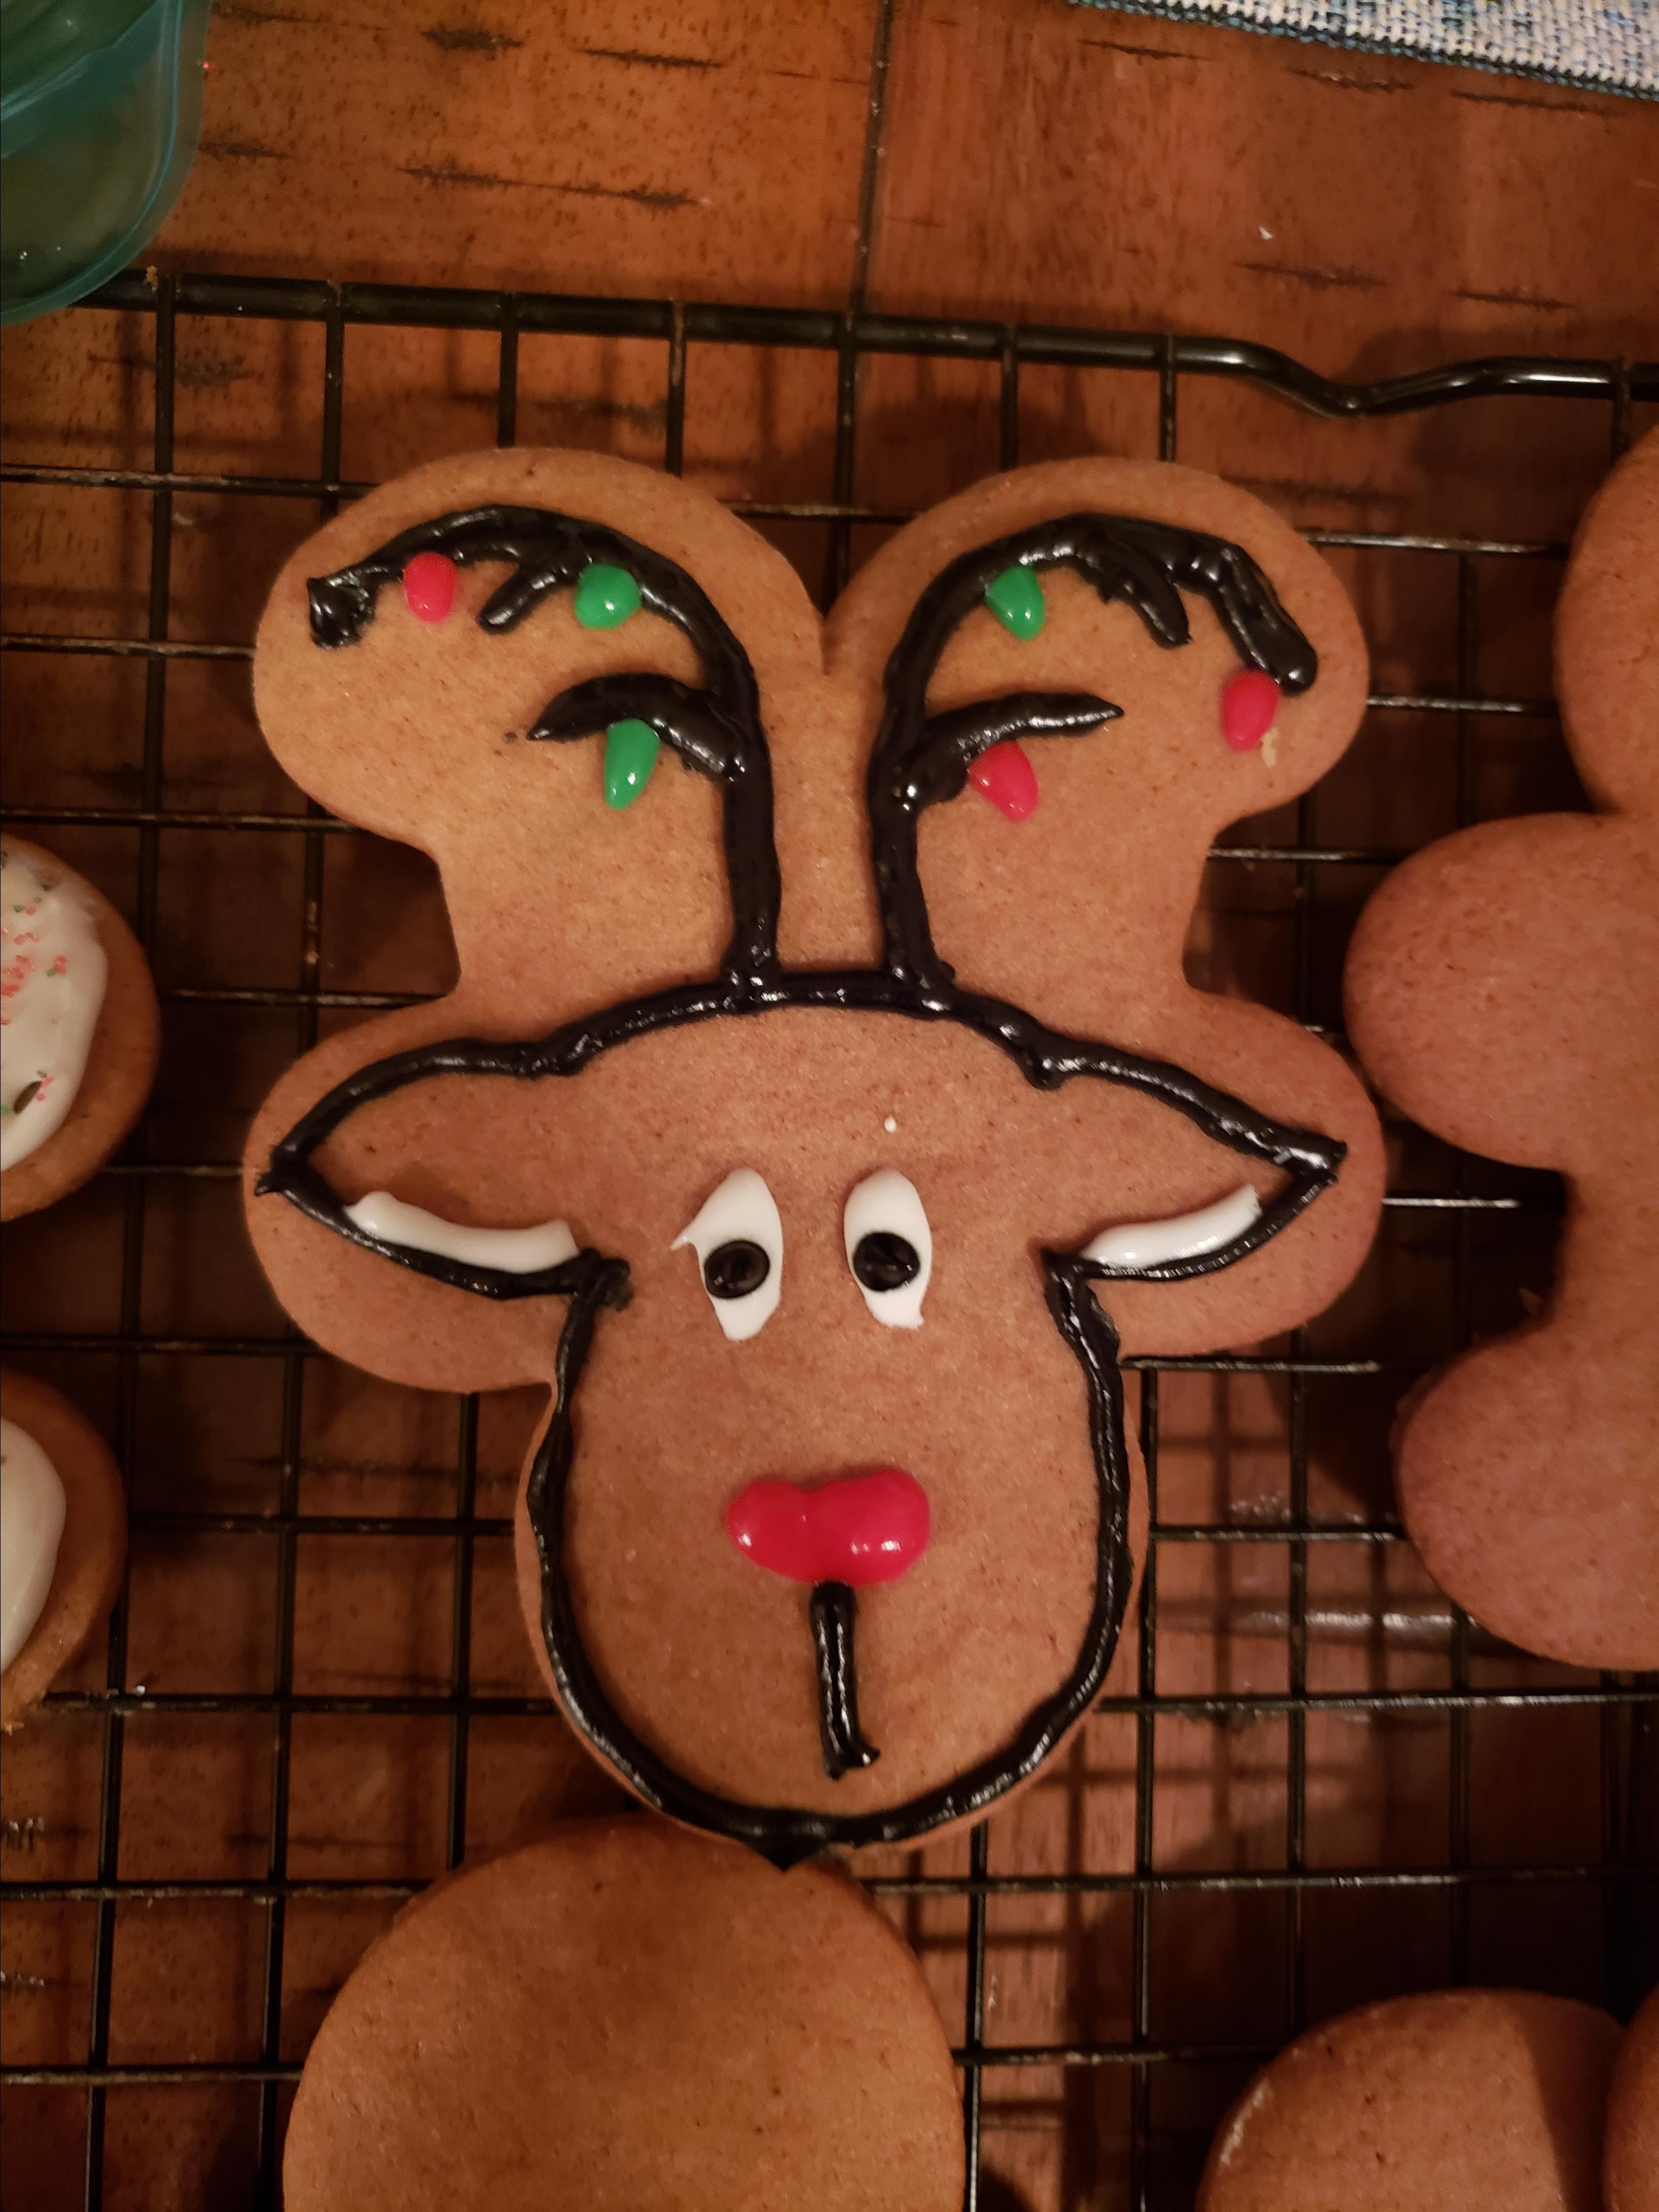 Gingerbread Men epspugnardi